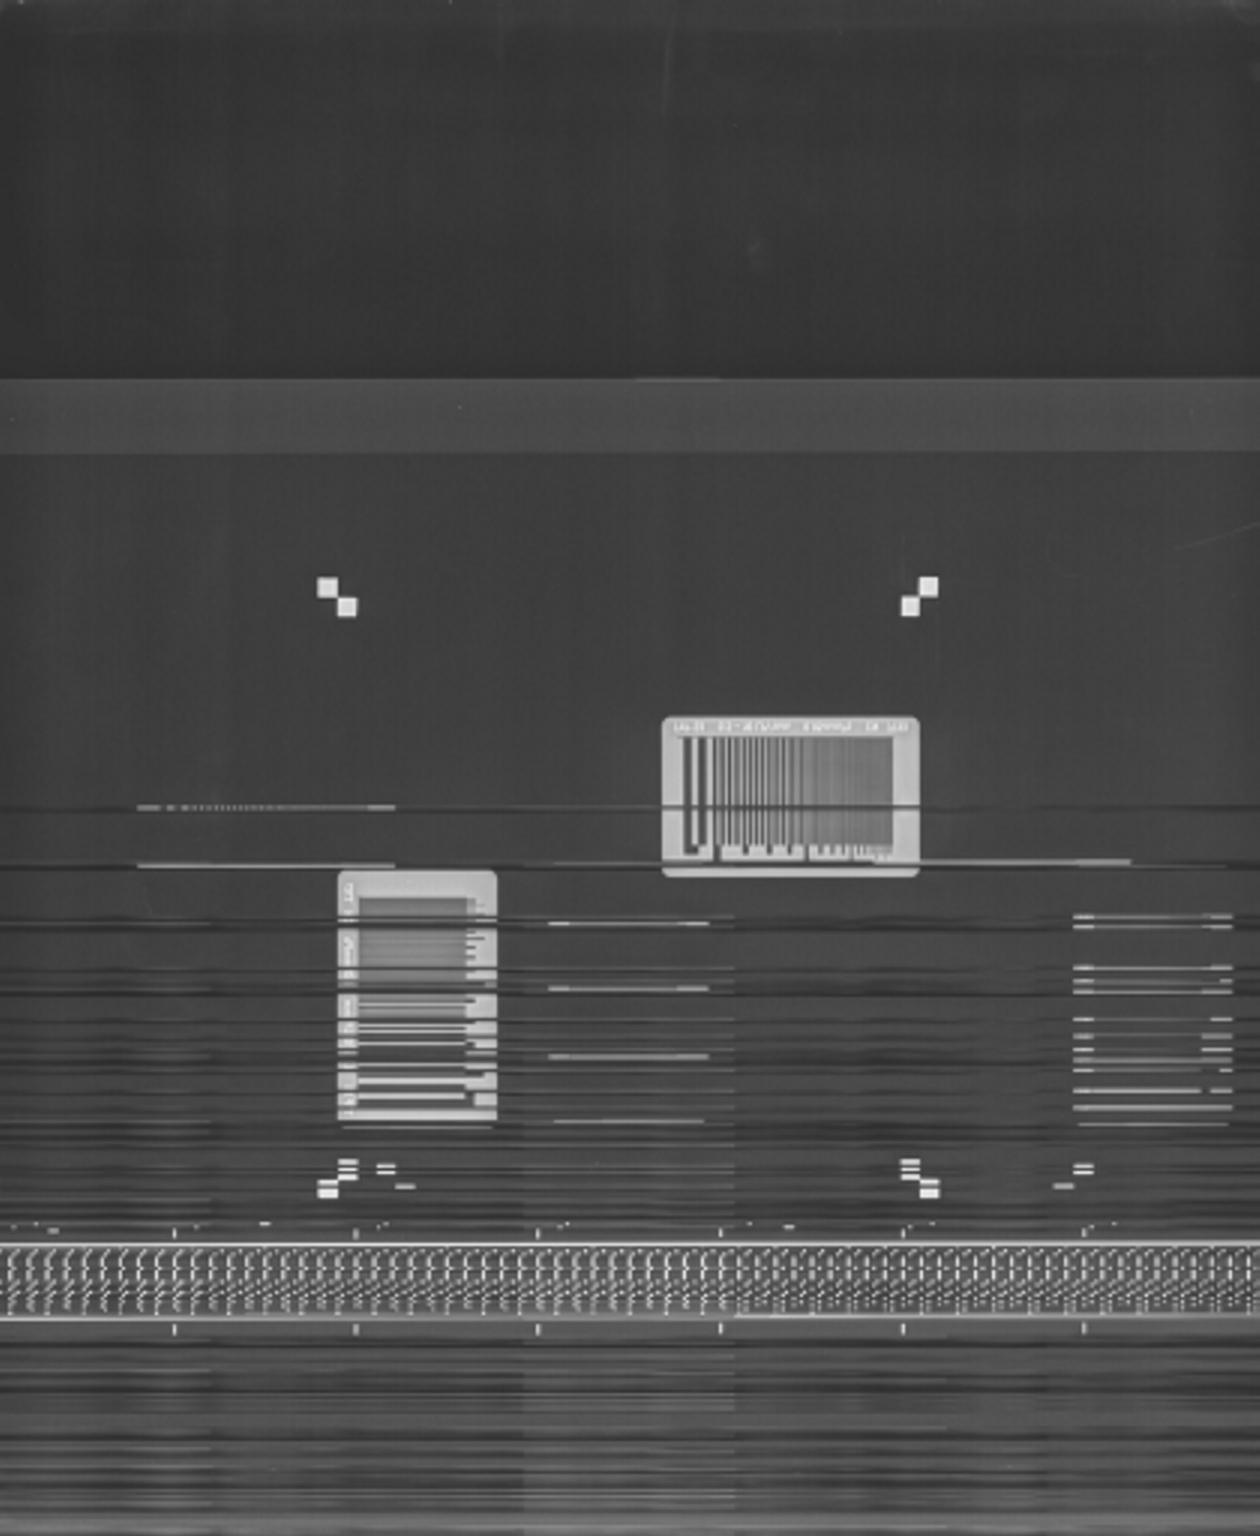 Digital Radiography Image Artifacts | Radiology | SUNY Upstate ...